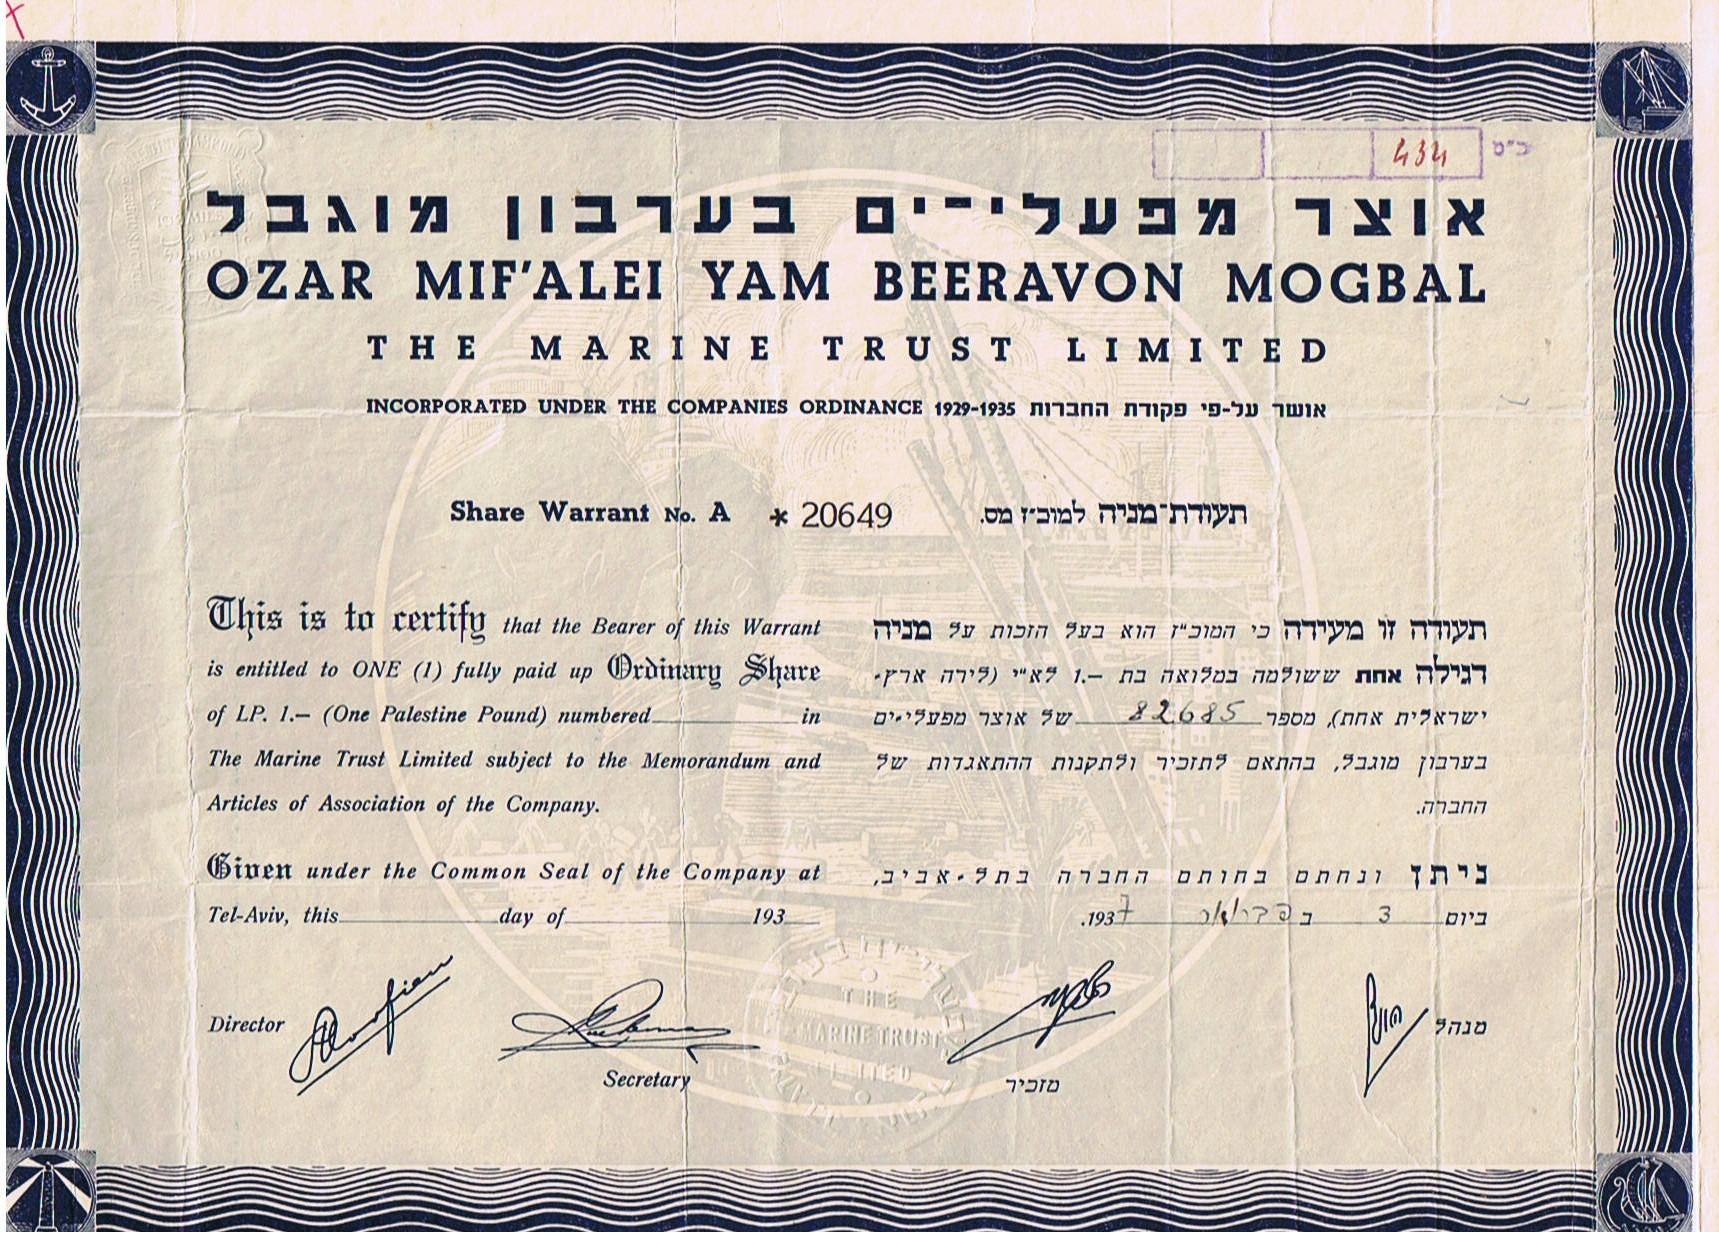 The Marine Trust Limited (Otzar Mifalei Yam)